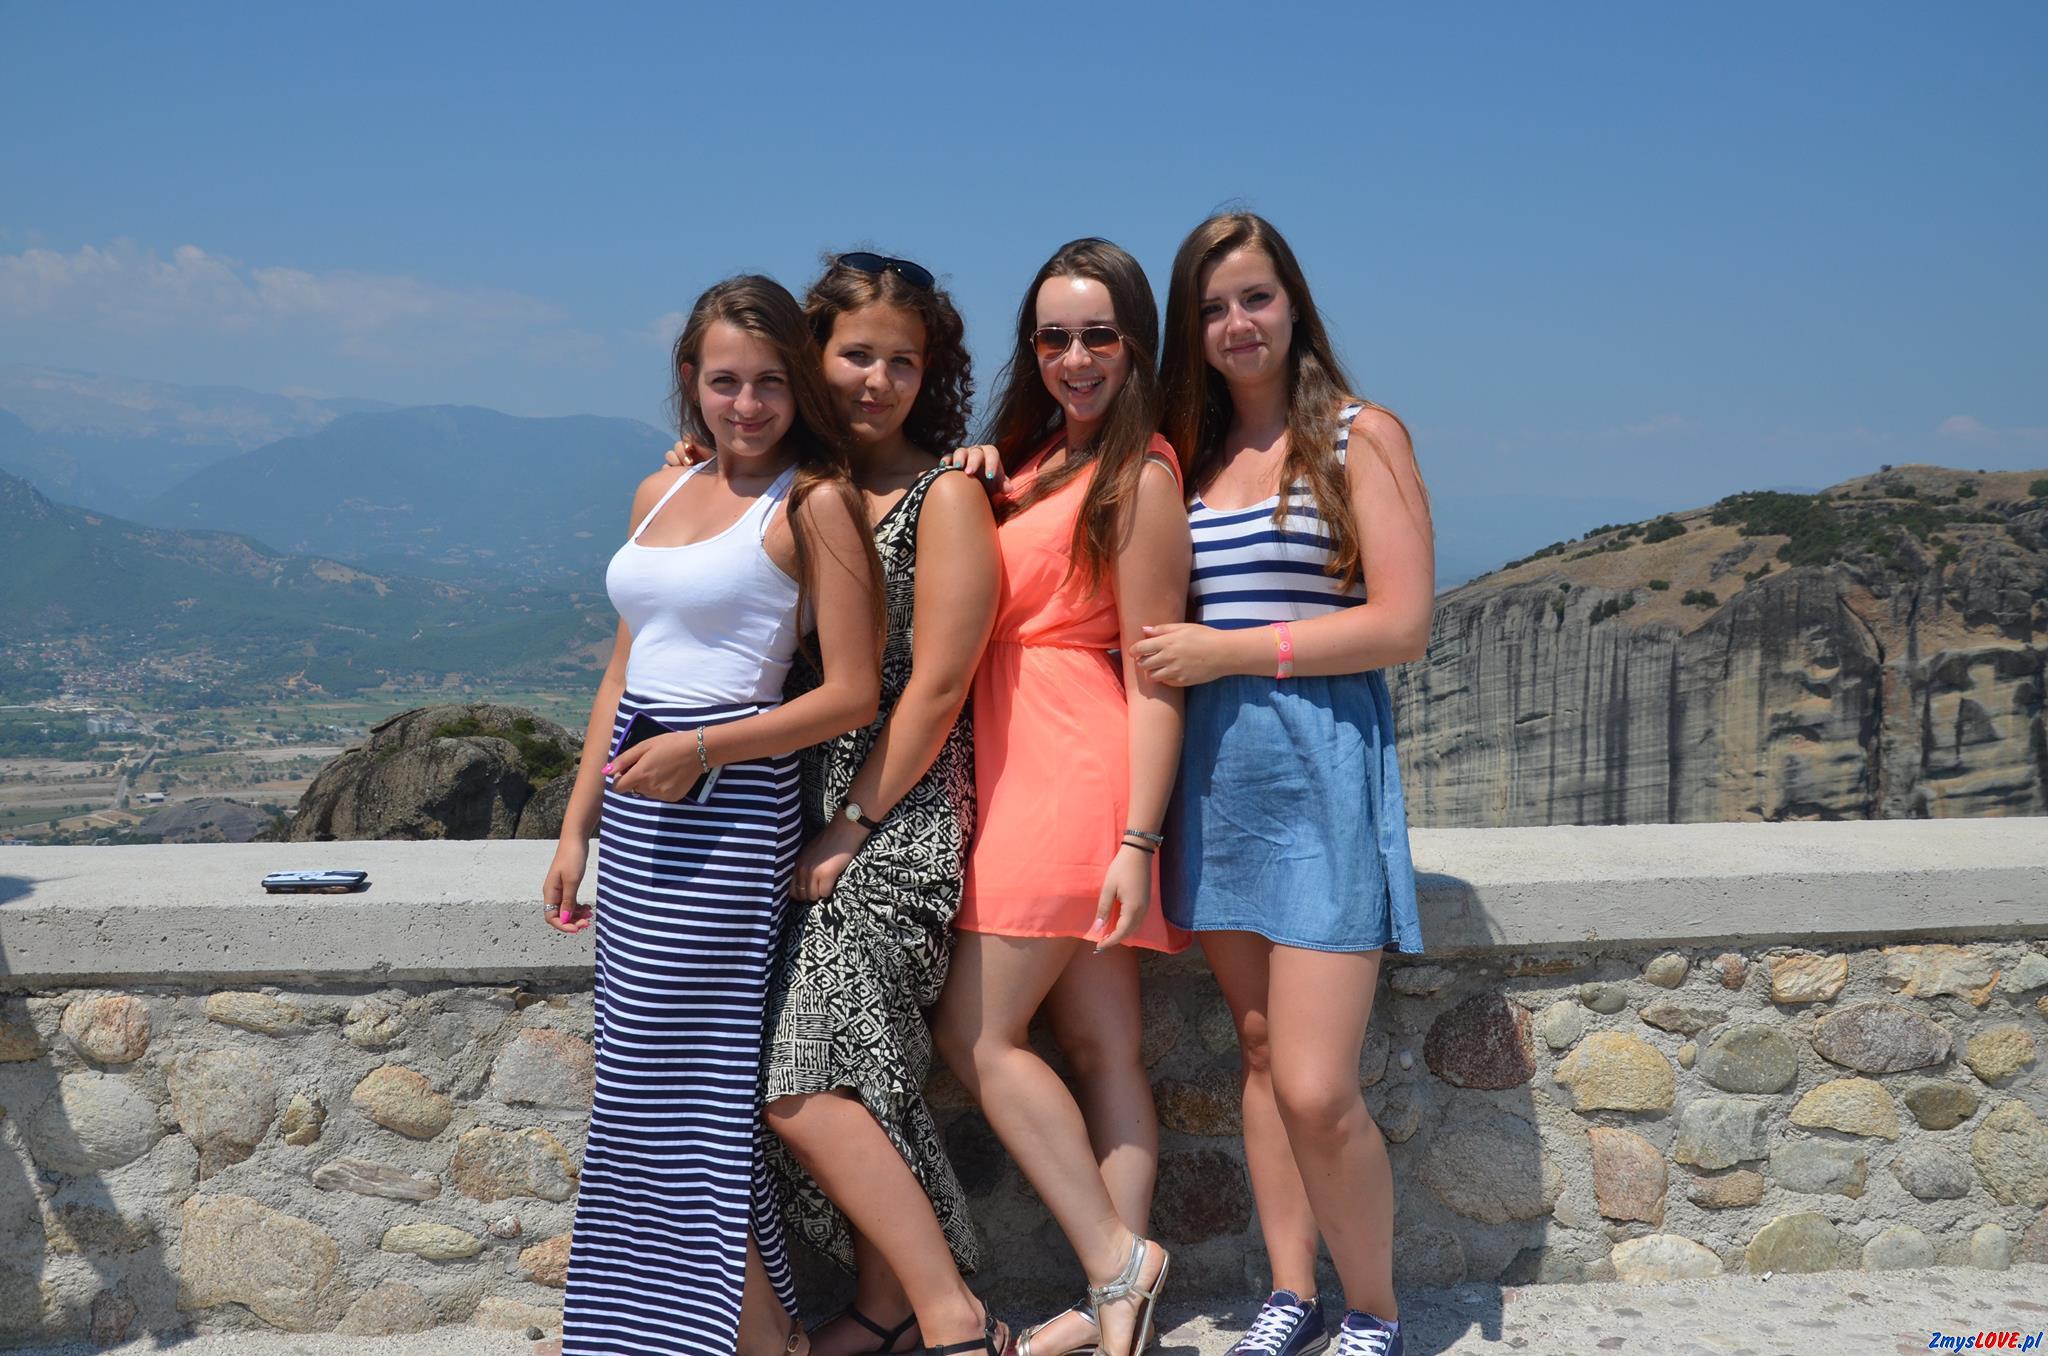 Agnieszka, Karolina, Asia, Kasia